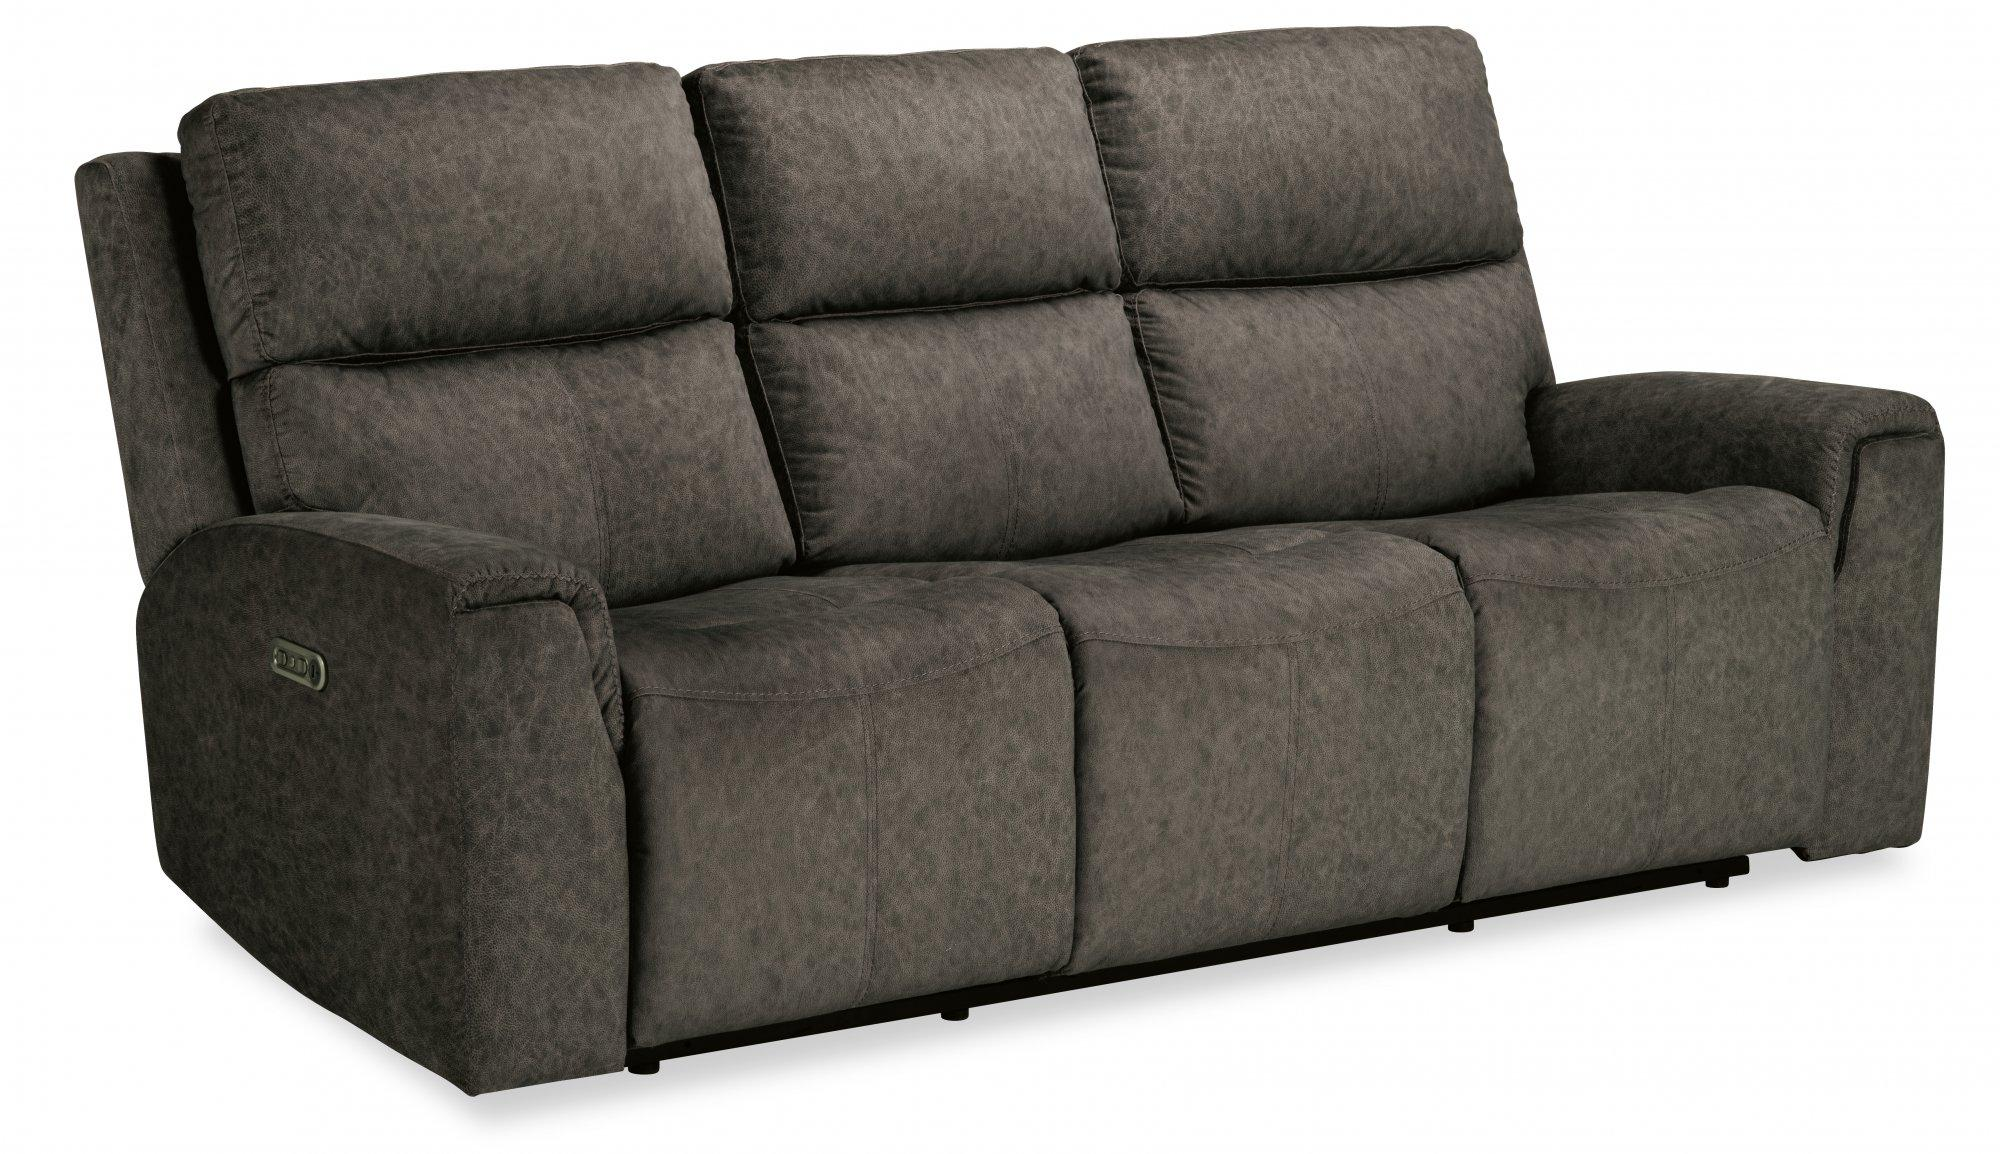 FlexsteelJarvis Power Reclining Sofa With Power Headrests